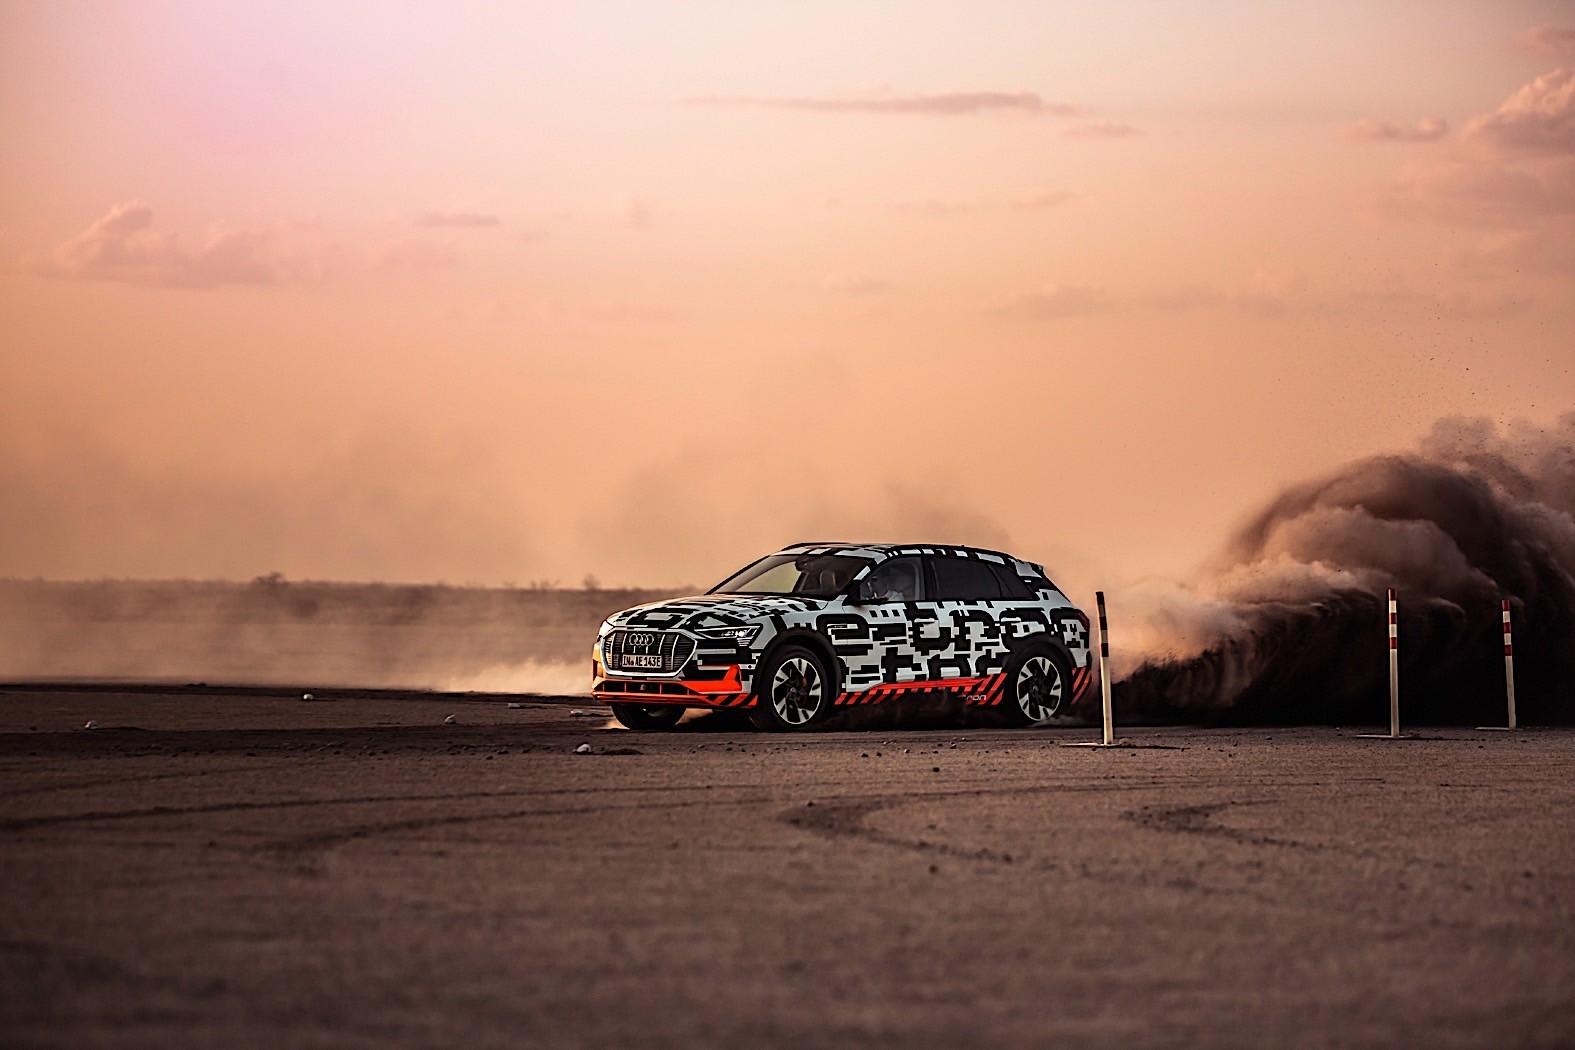 Audi e-tron Prototype Drifting in the Kalahari Desert in ...